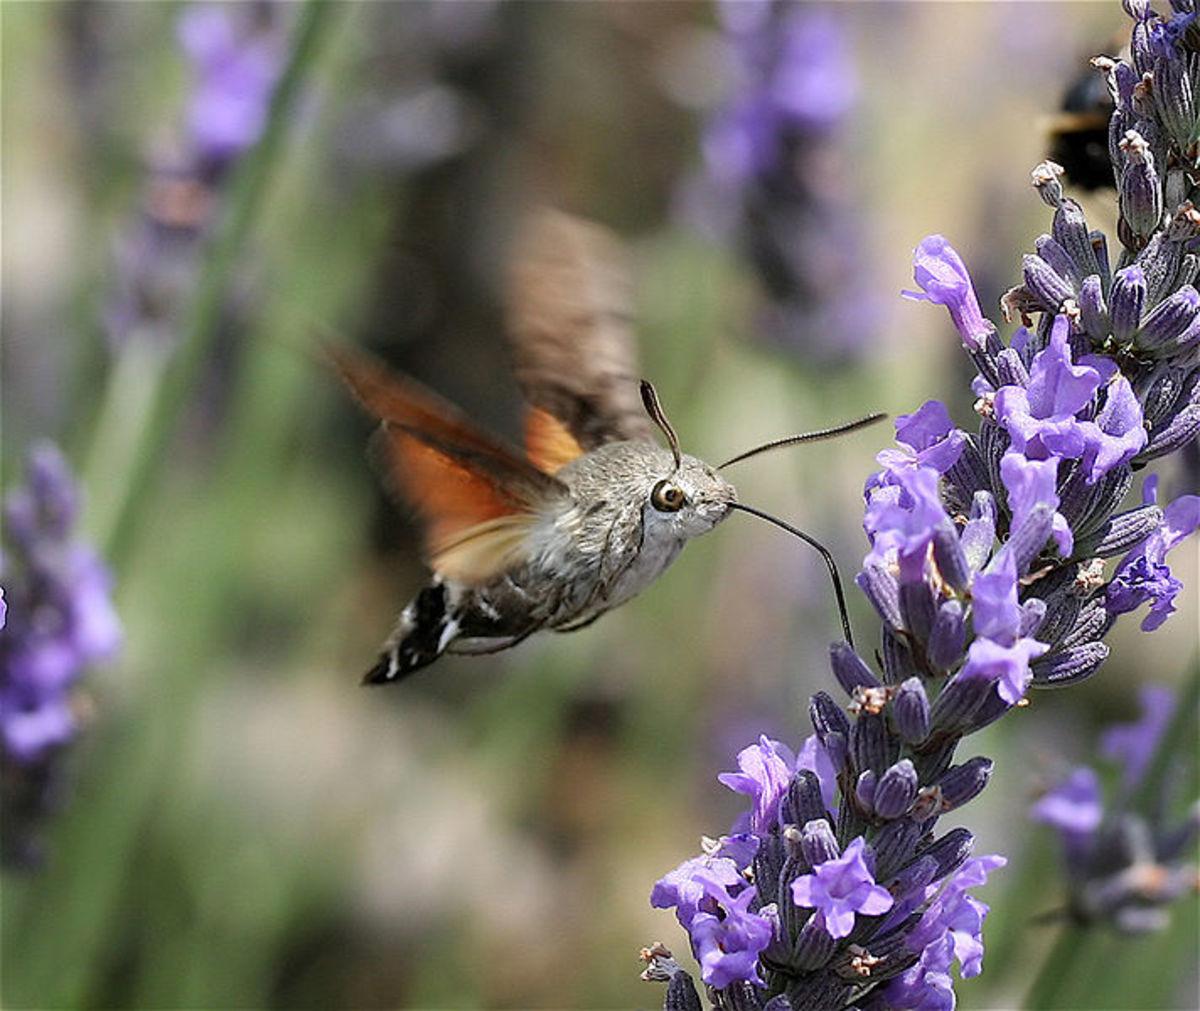 Hummingbird Hawk Moth feeding. Photo by IronChris